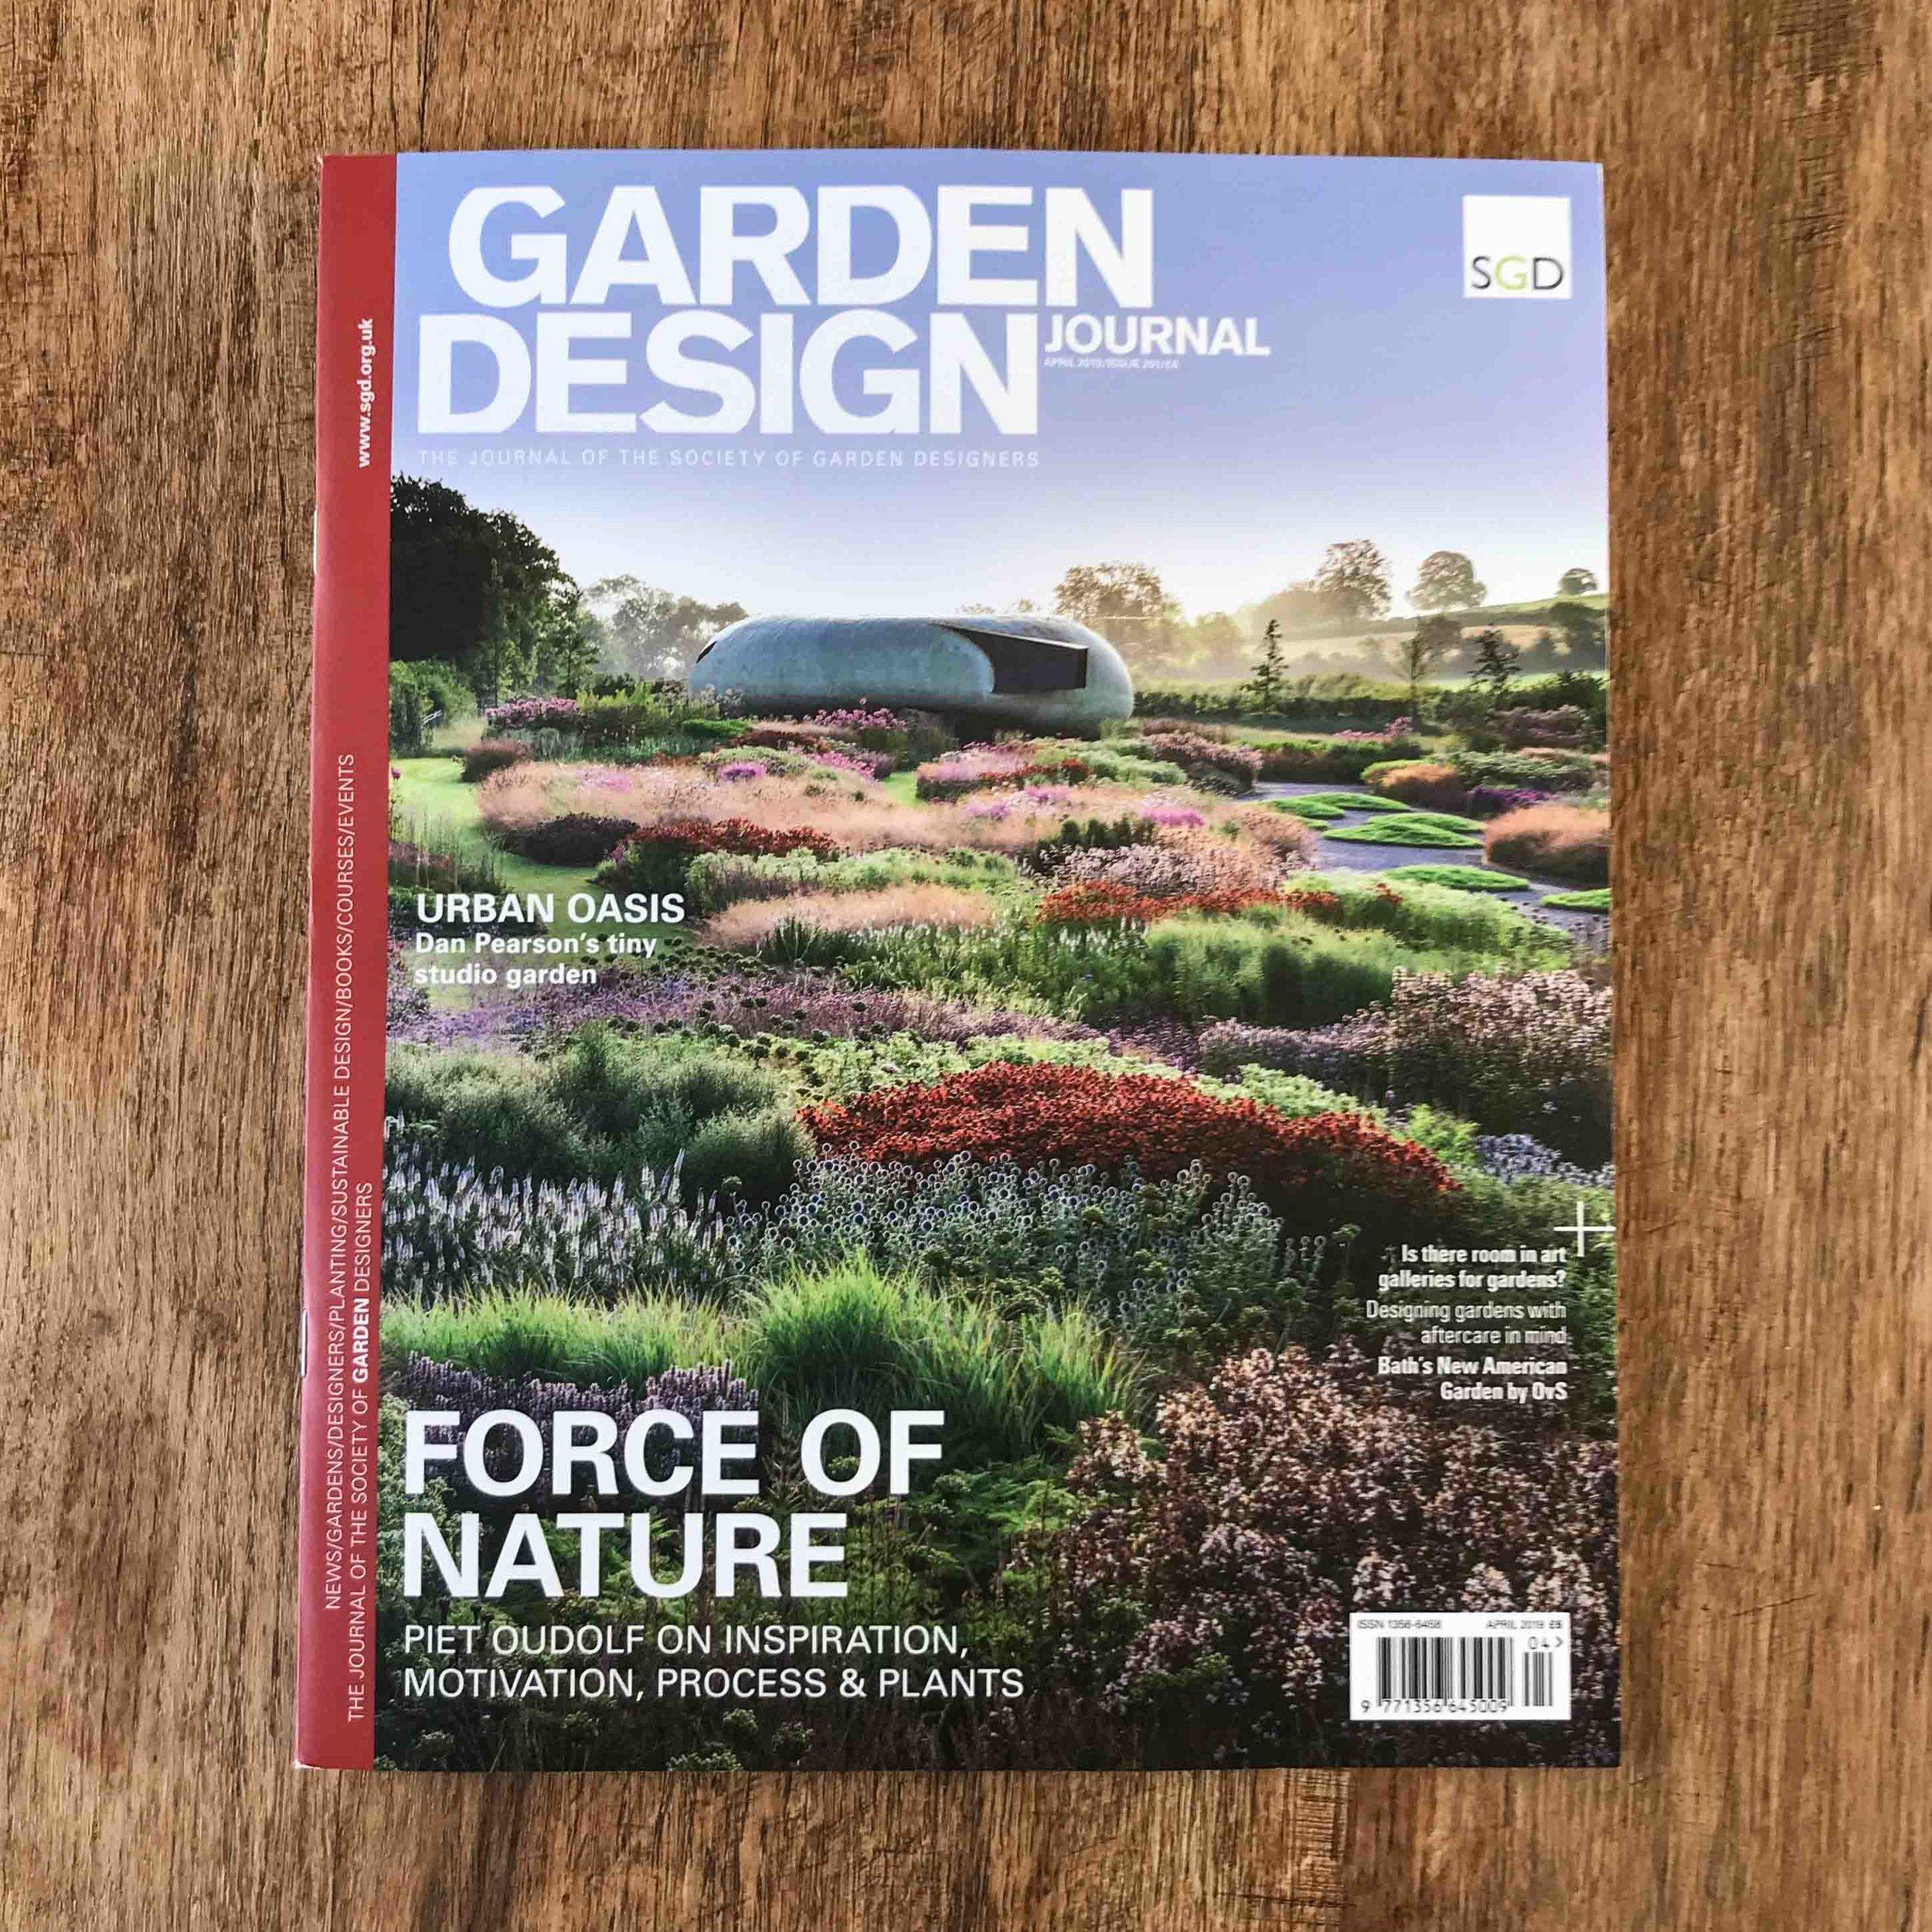 garden design journal colm joseph cambridge garden designer.jpg